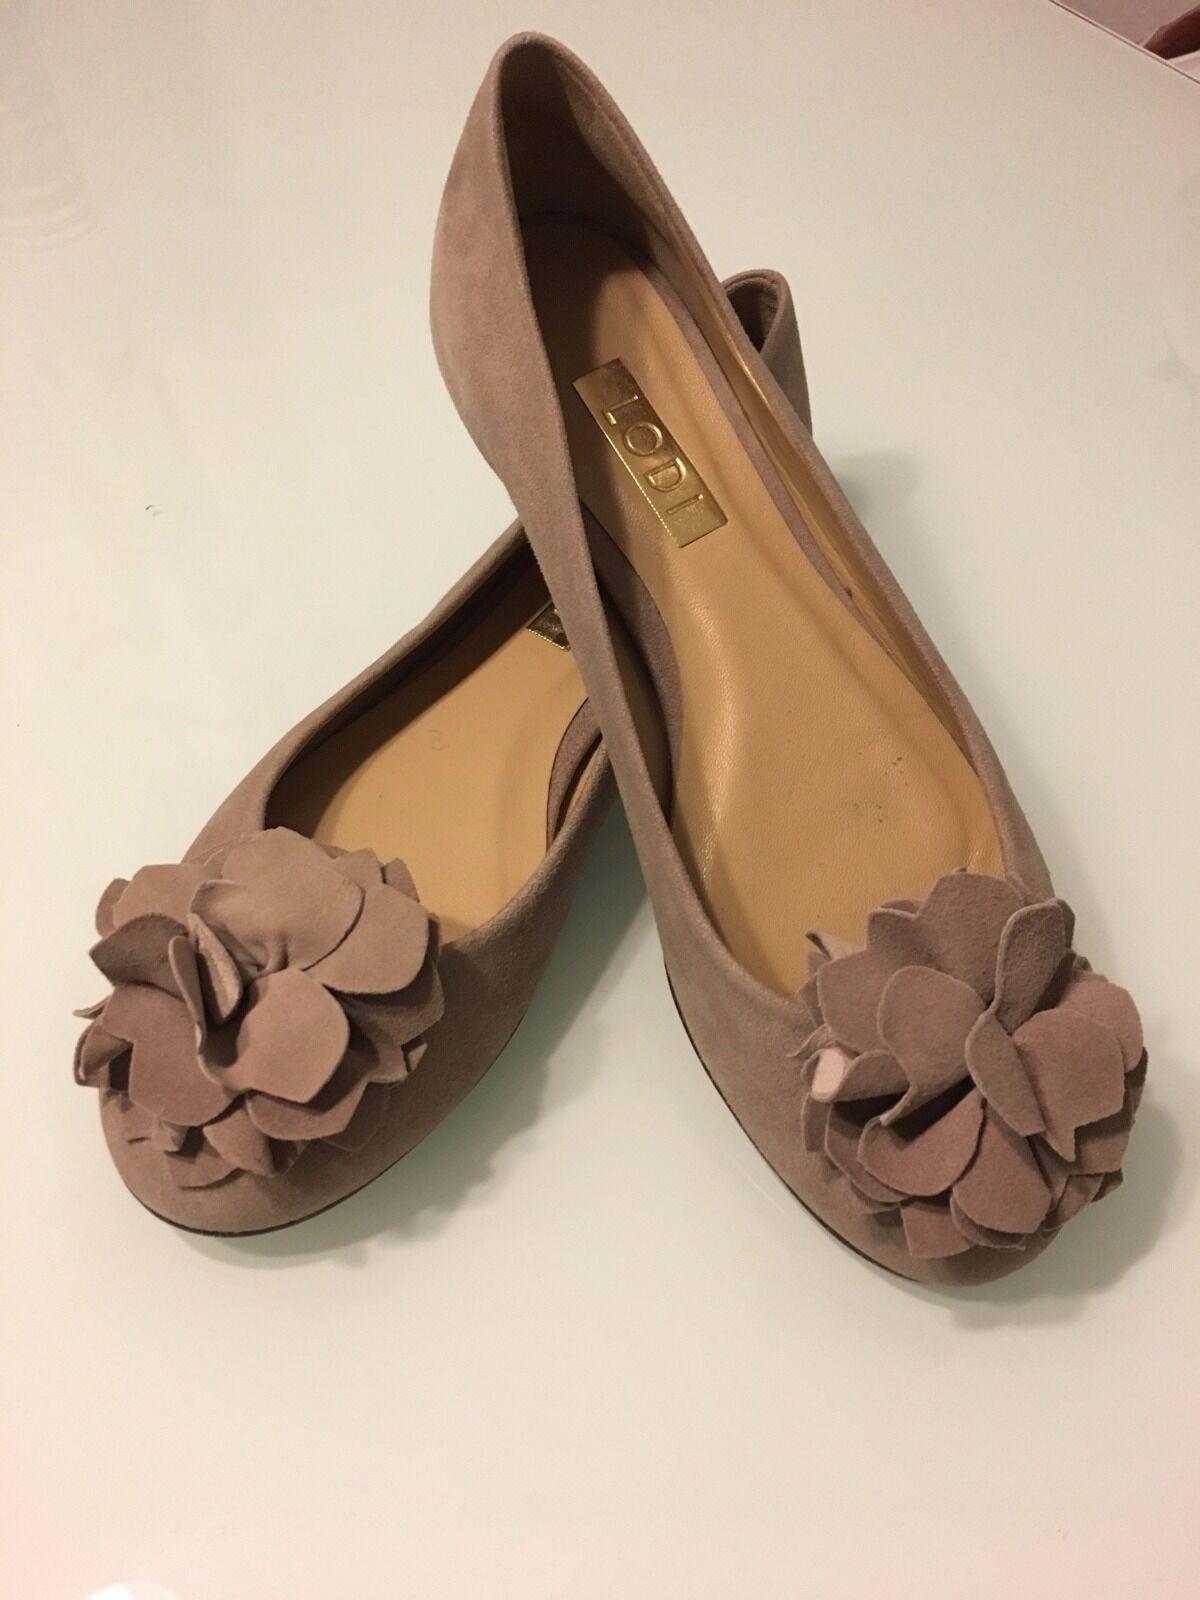 Zapatos señora, Lodi Lodi Lodi bailarina de enloquecer de gamuza, tamaño 36,5  hasta un 60% de descuento